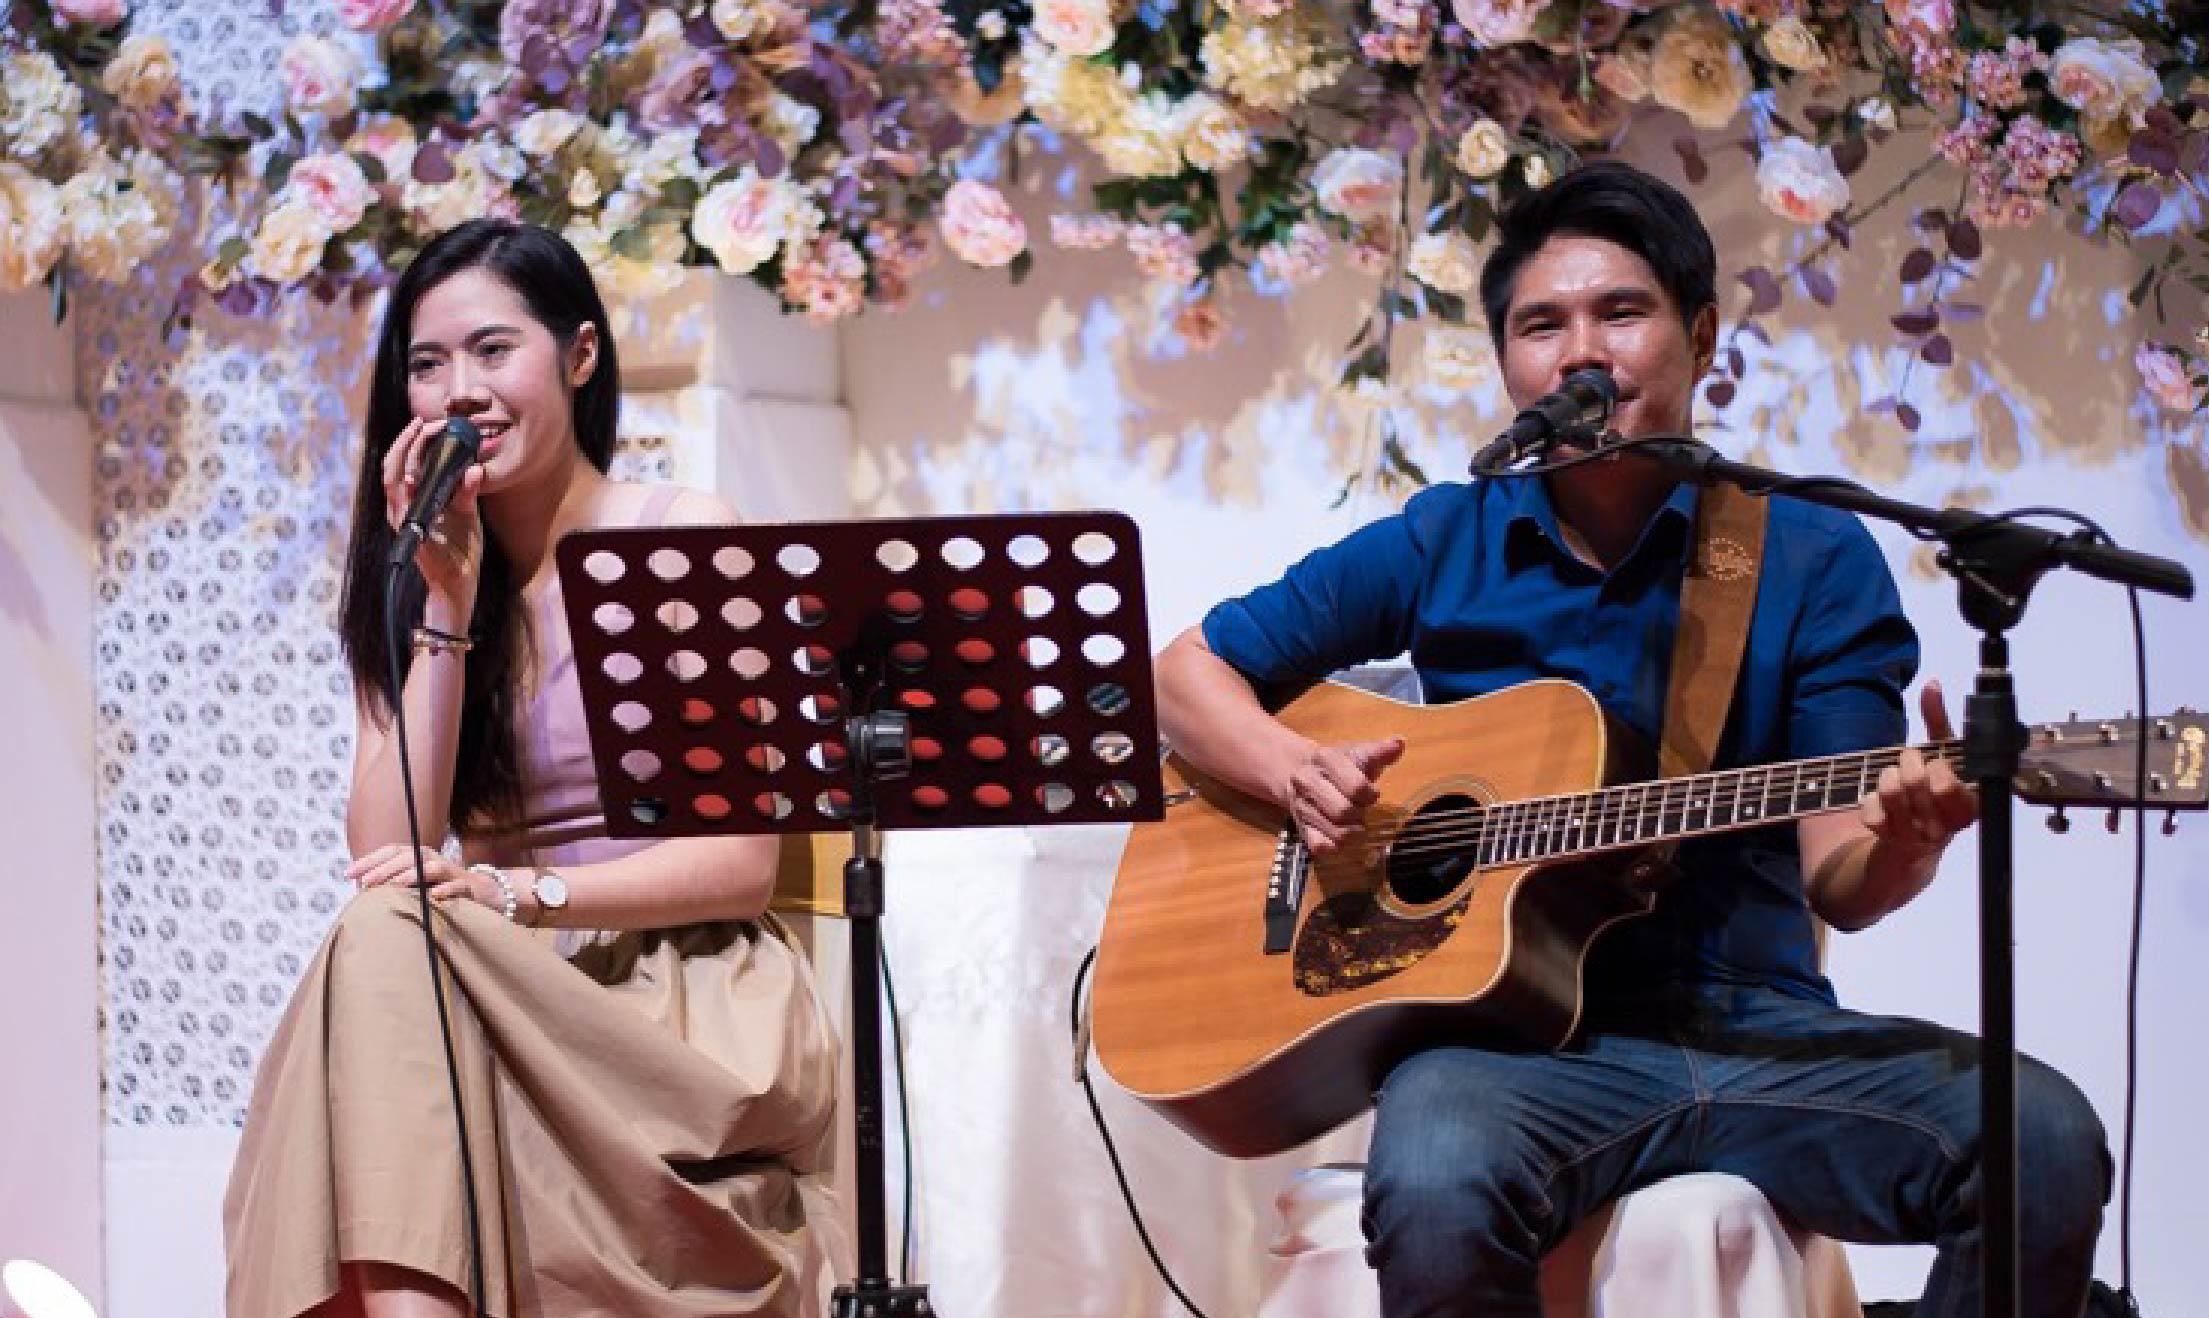 Yogi band วงดนตรีงานแต่งงานที่The Banquet Hall at Nathong